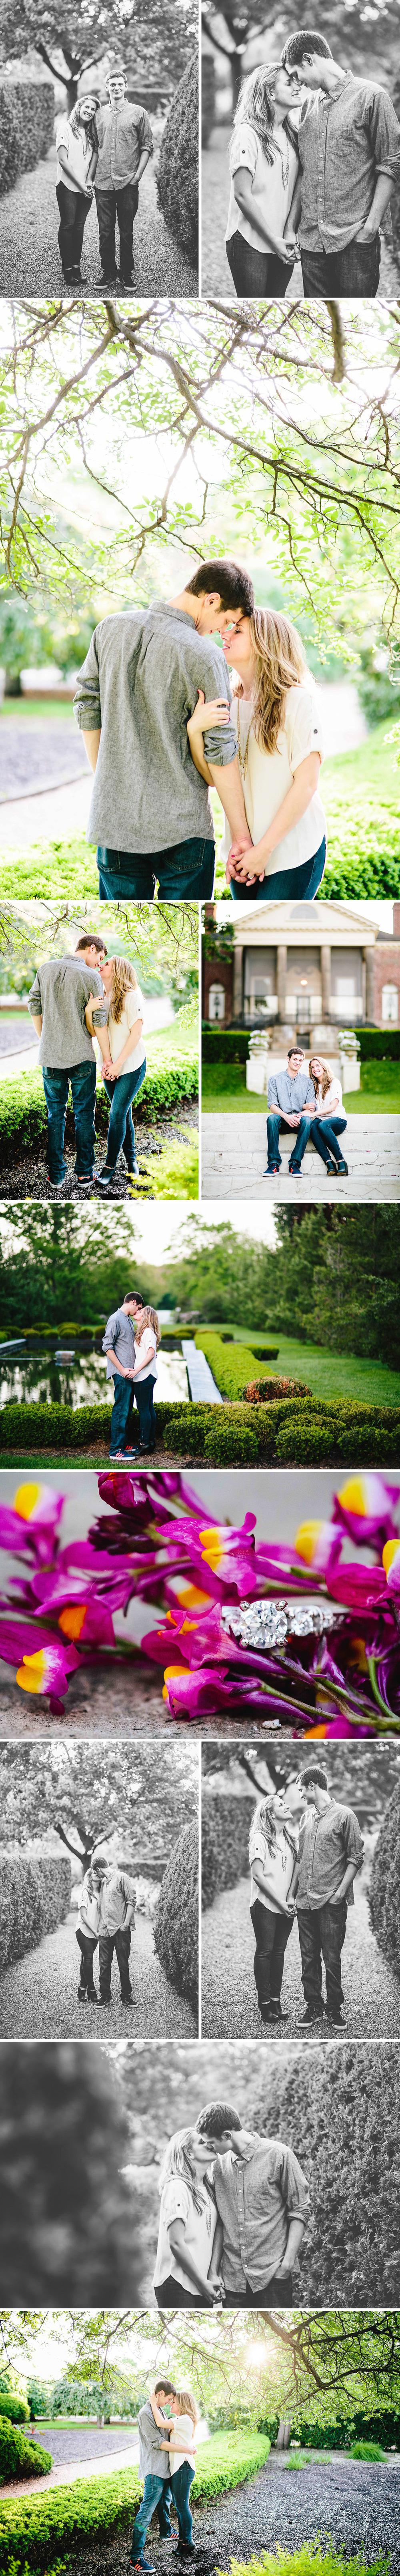 chicago-fine-art-wedding-photography-tl1